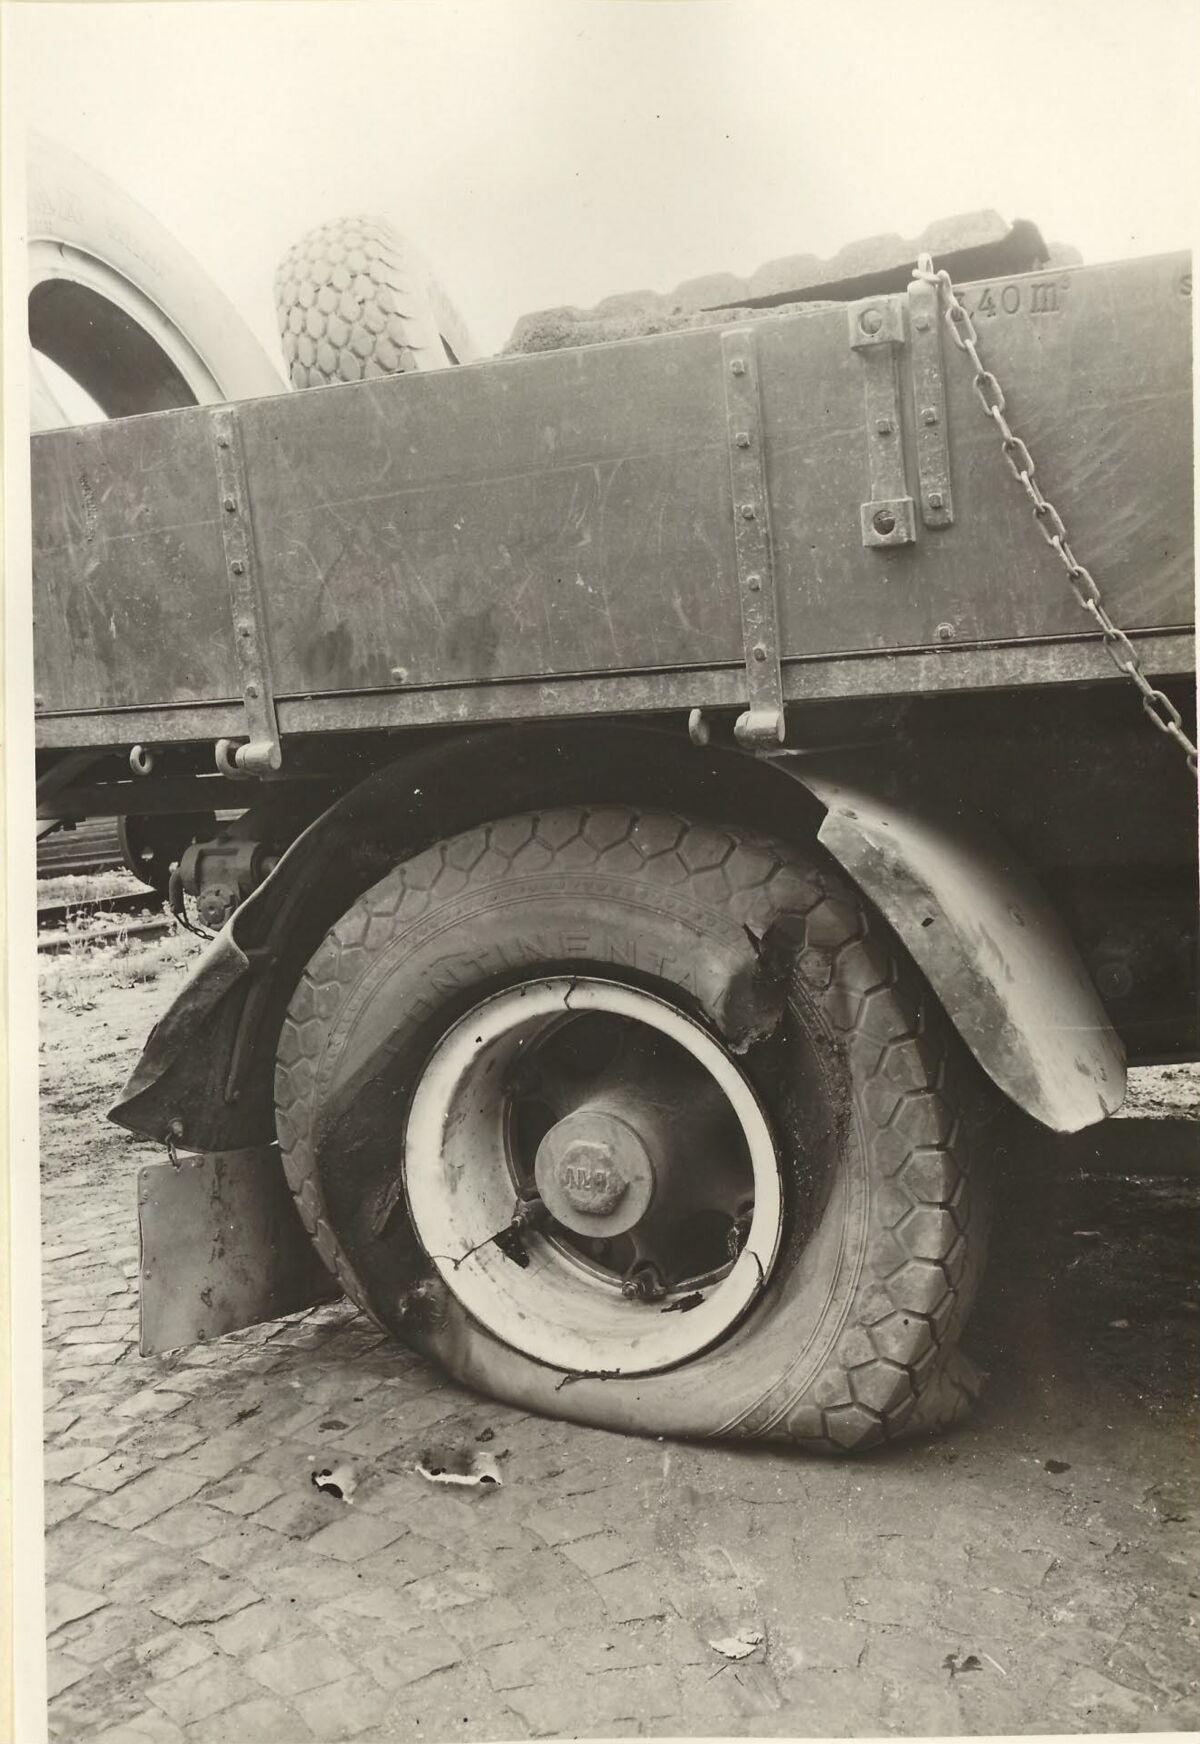 GFA 24/53.1333: Wheel test